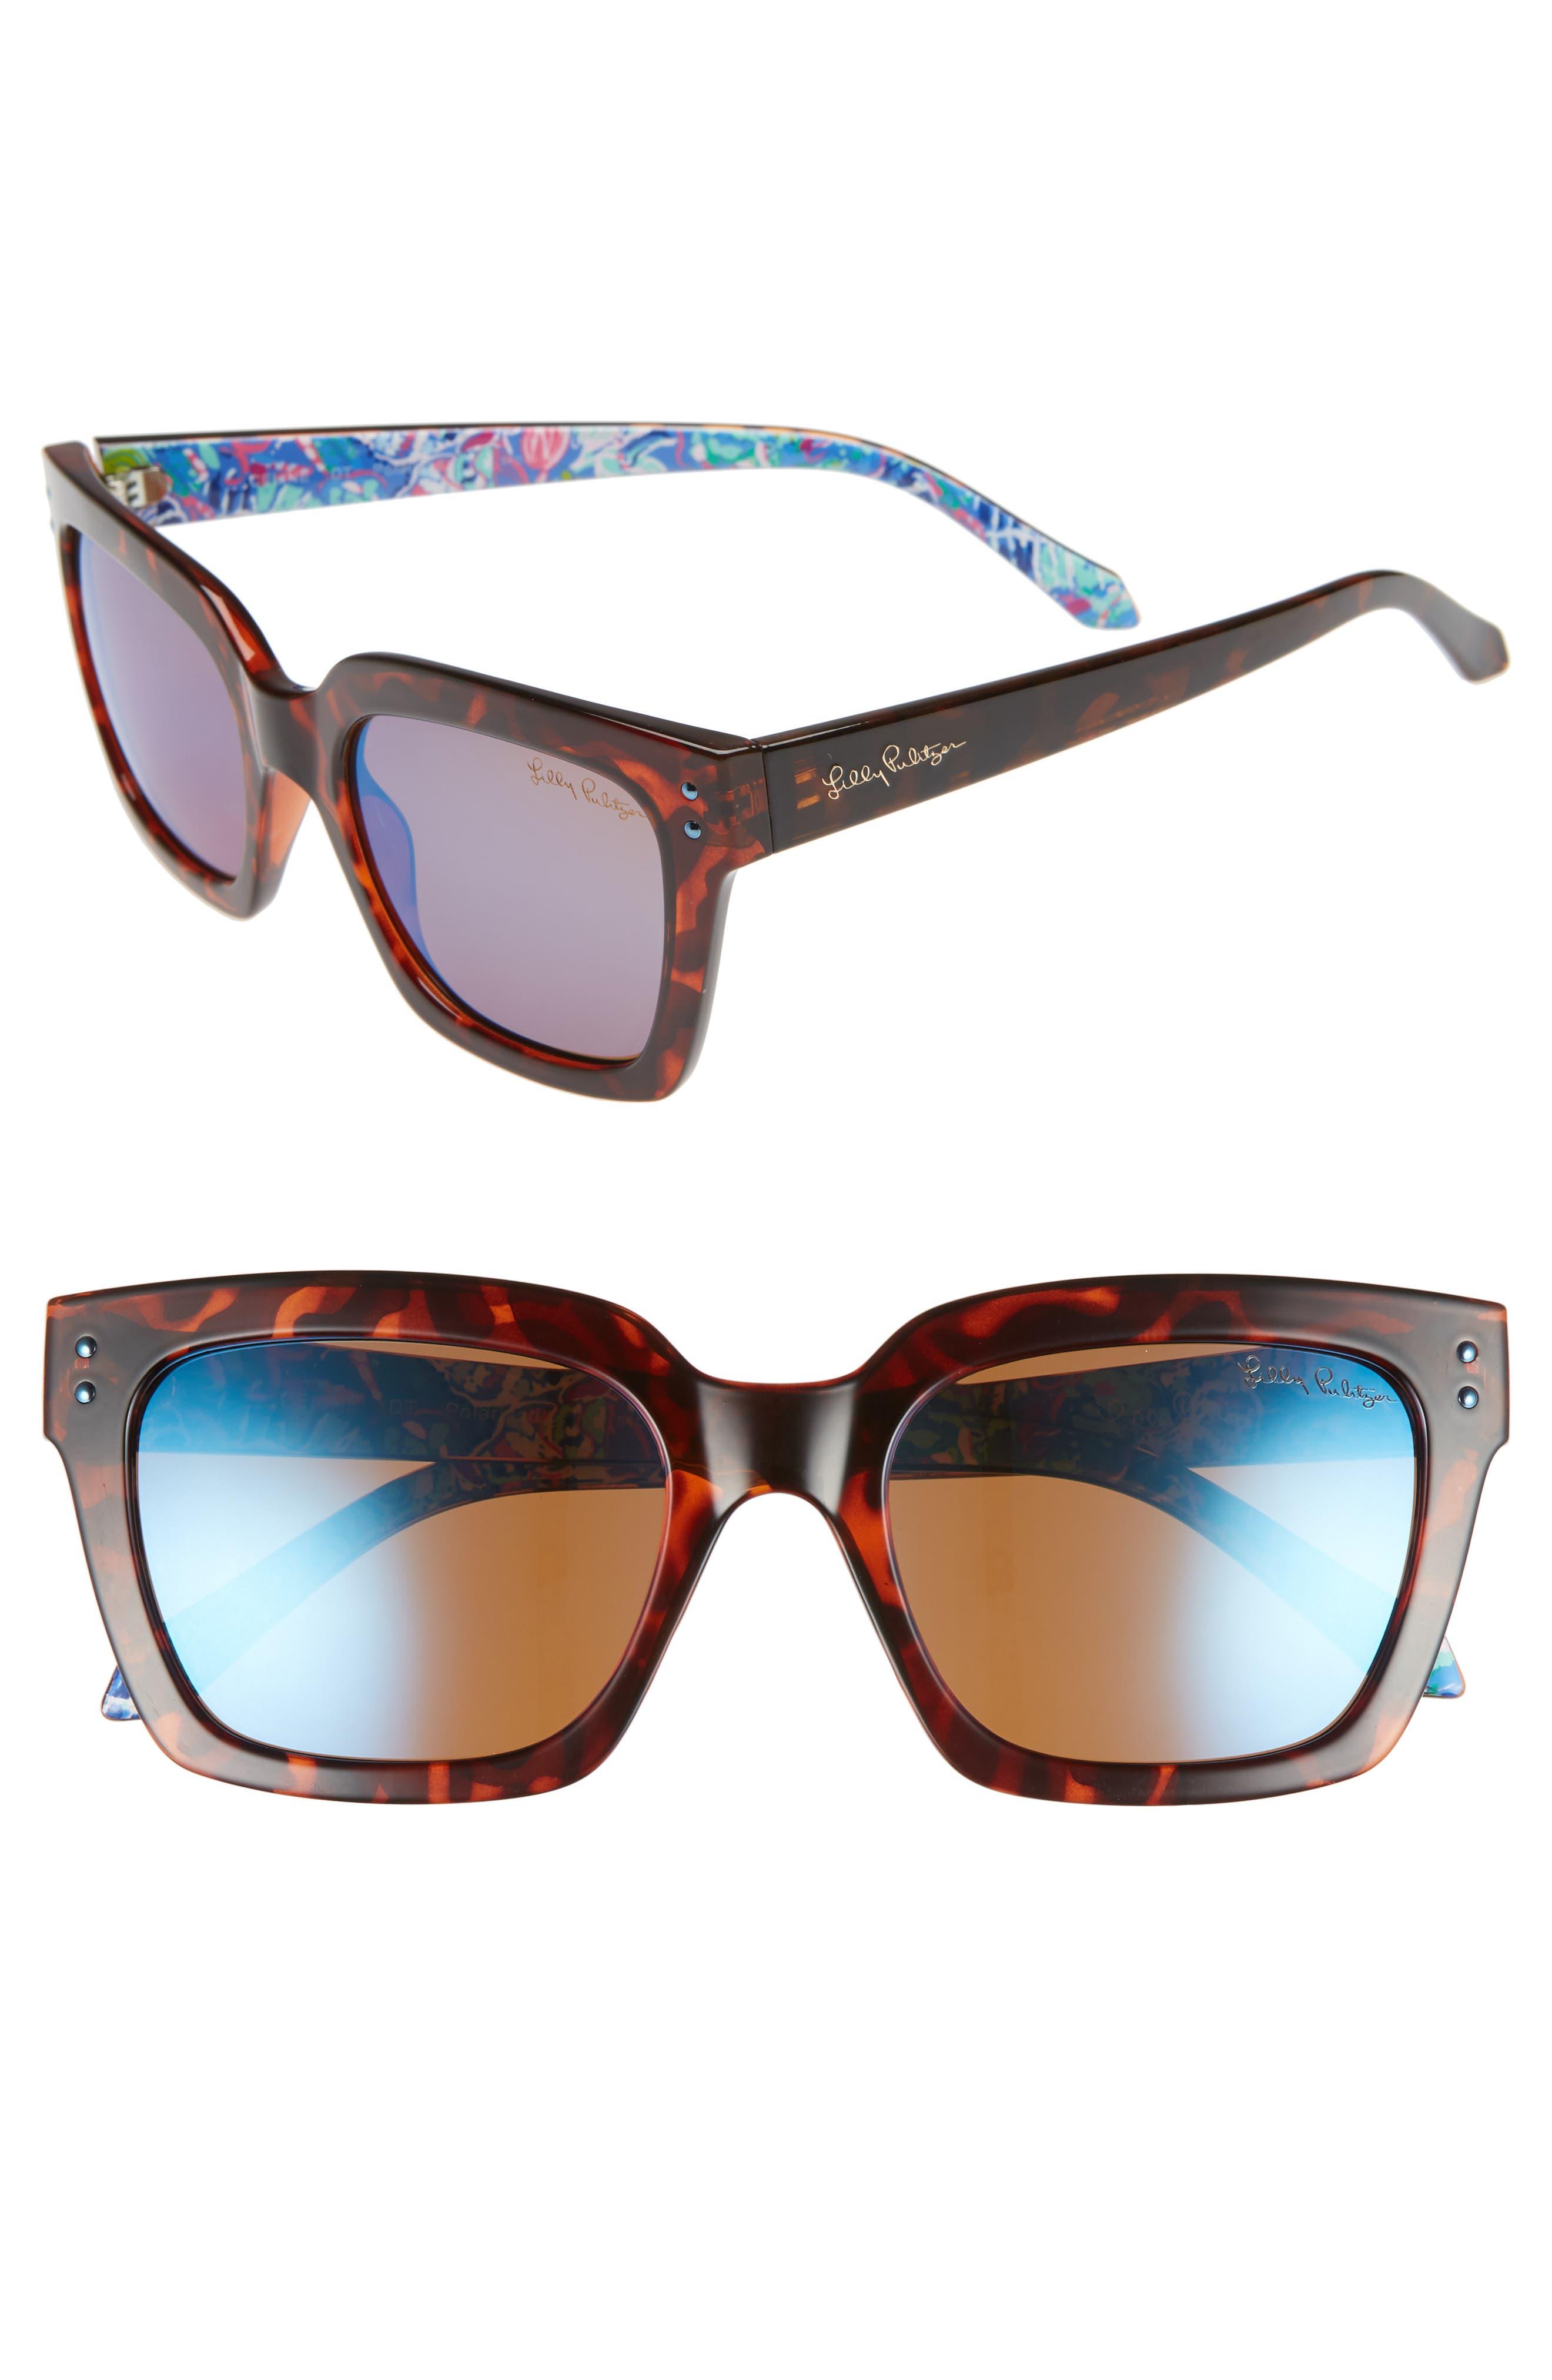 Lilly Pulitzer Celine 5m Polarized Square Sunglasses - Dark Tortoise/ Blue Flash